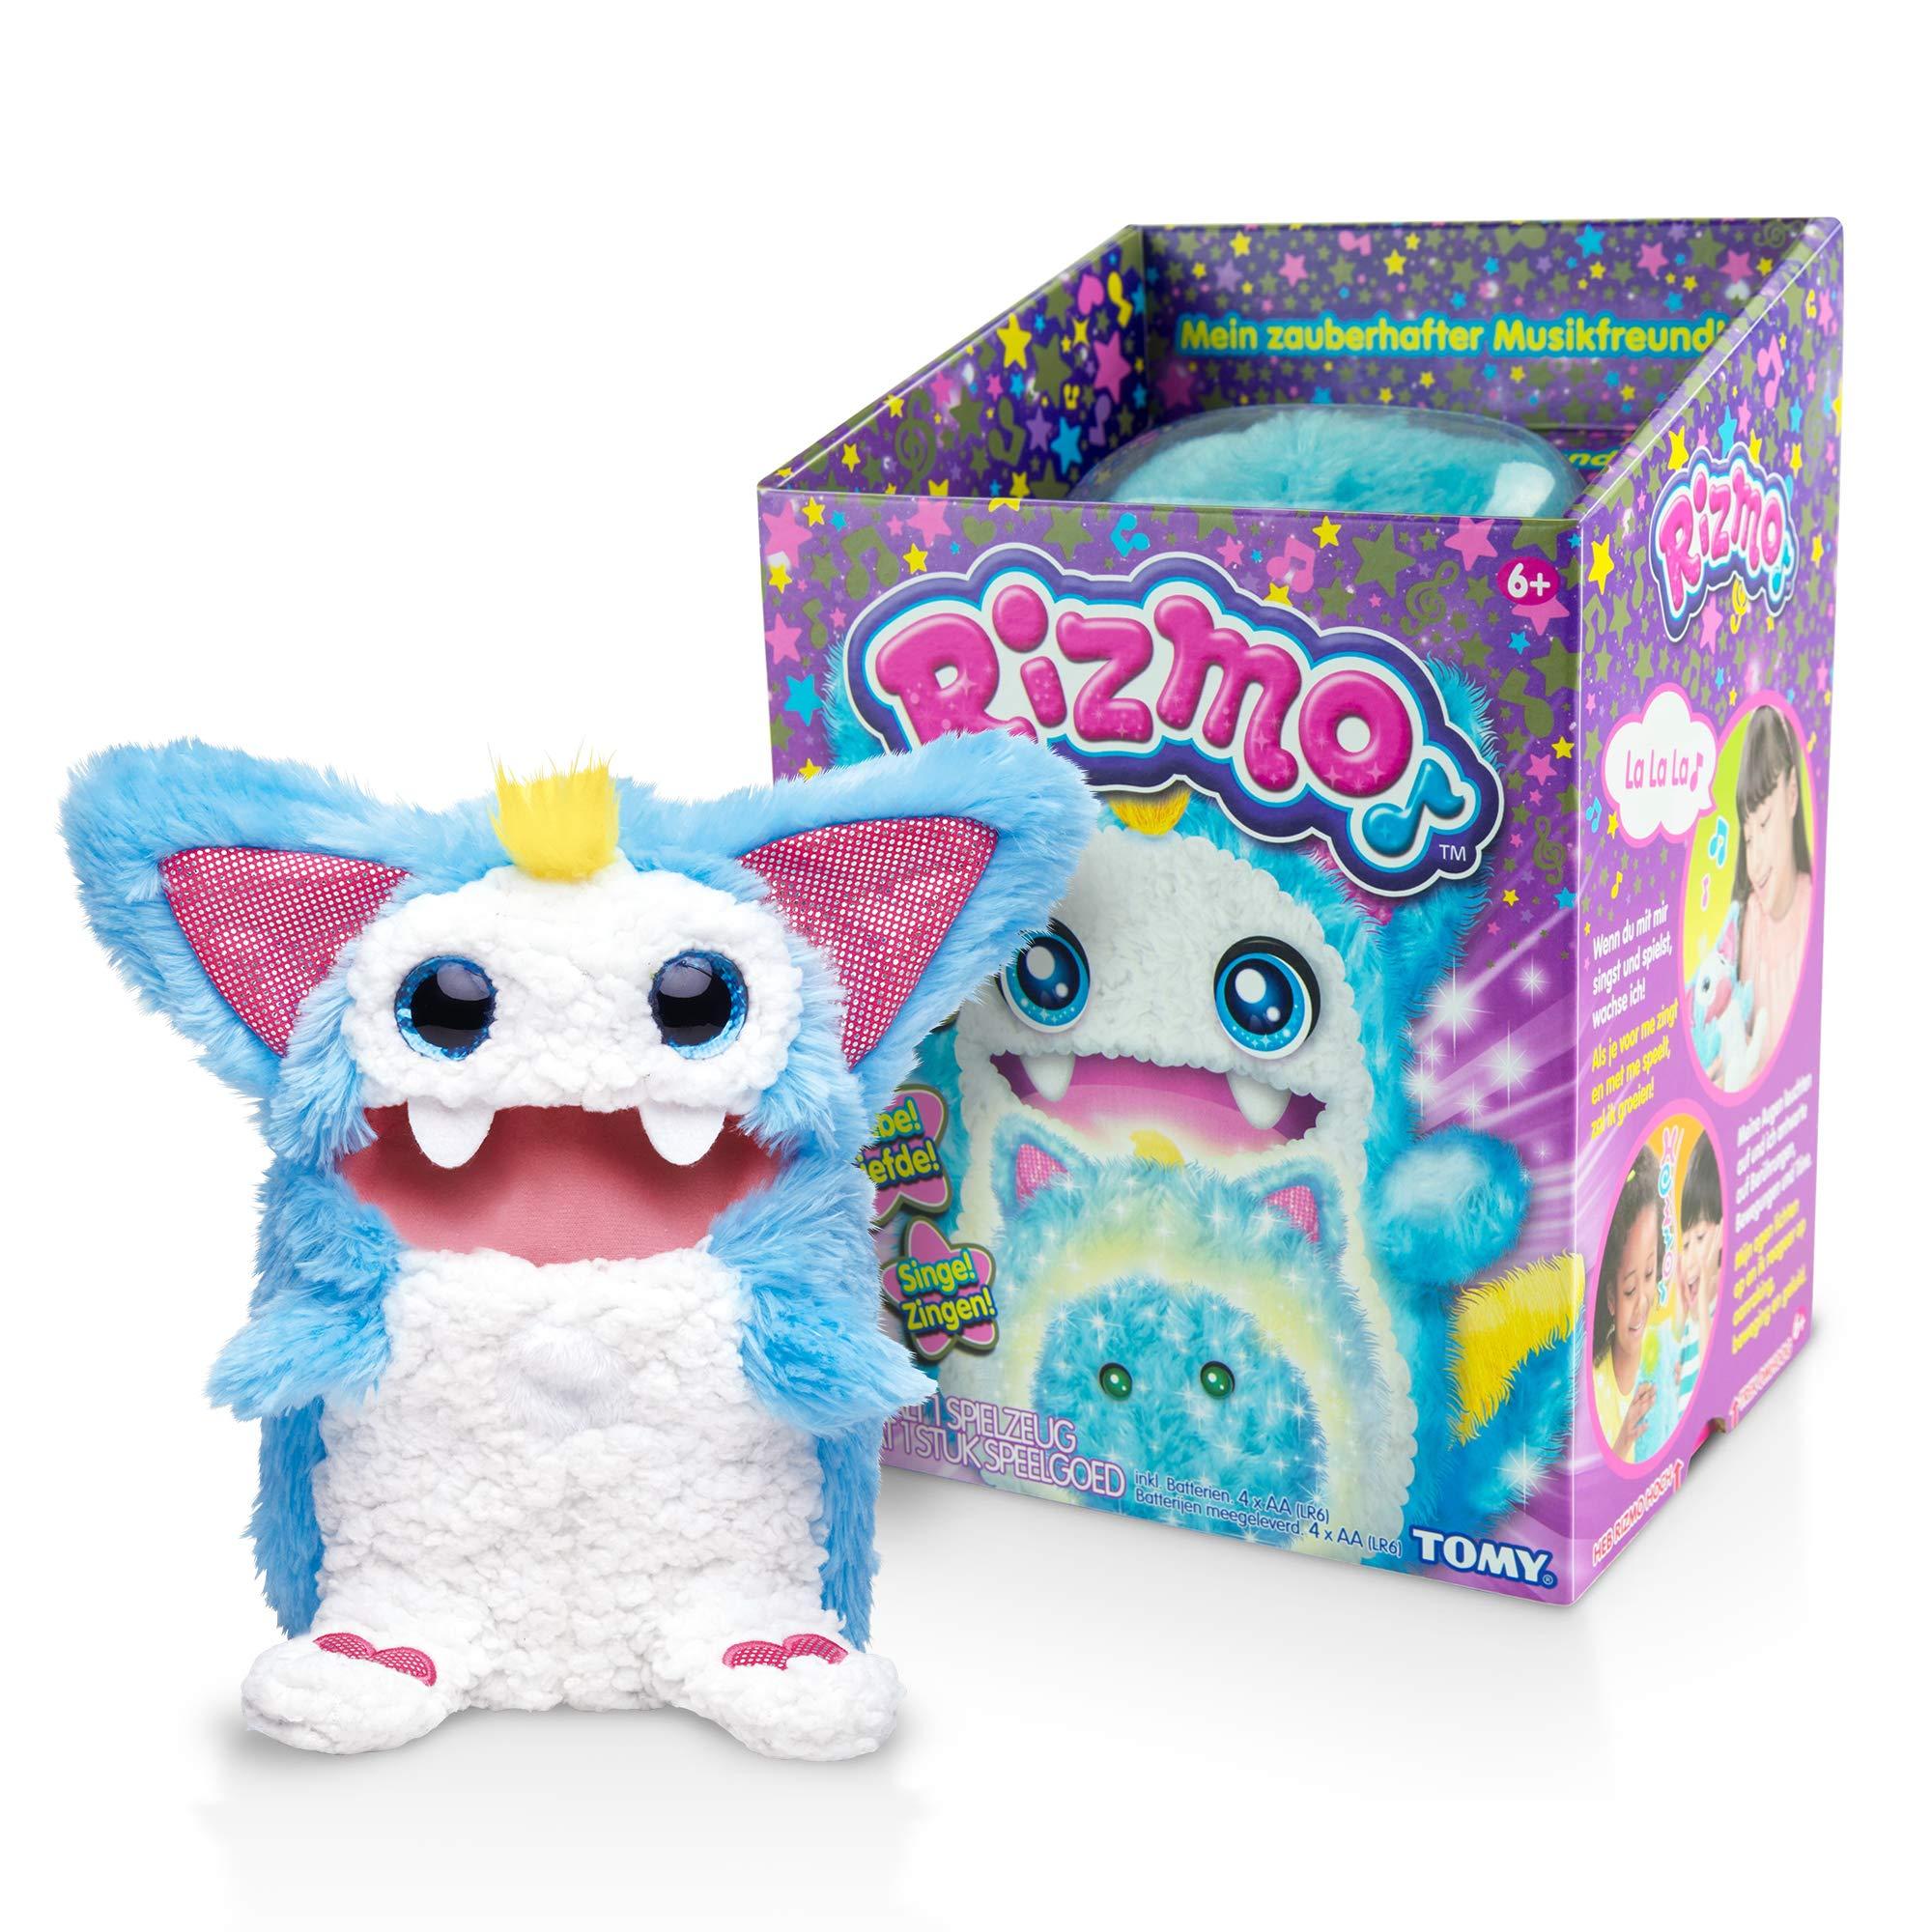 Rizmo Evolving Musical Friend Interactive Plush Toy with Fun Games, Aqua by Rizmo